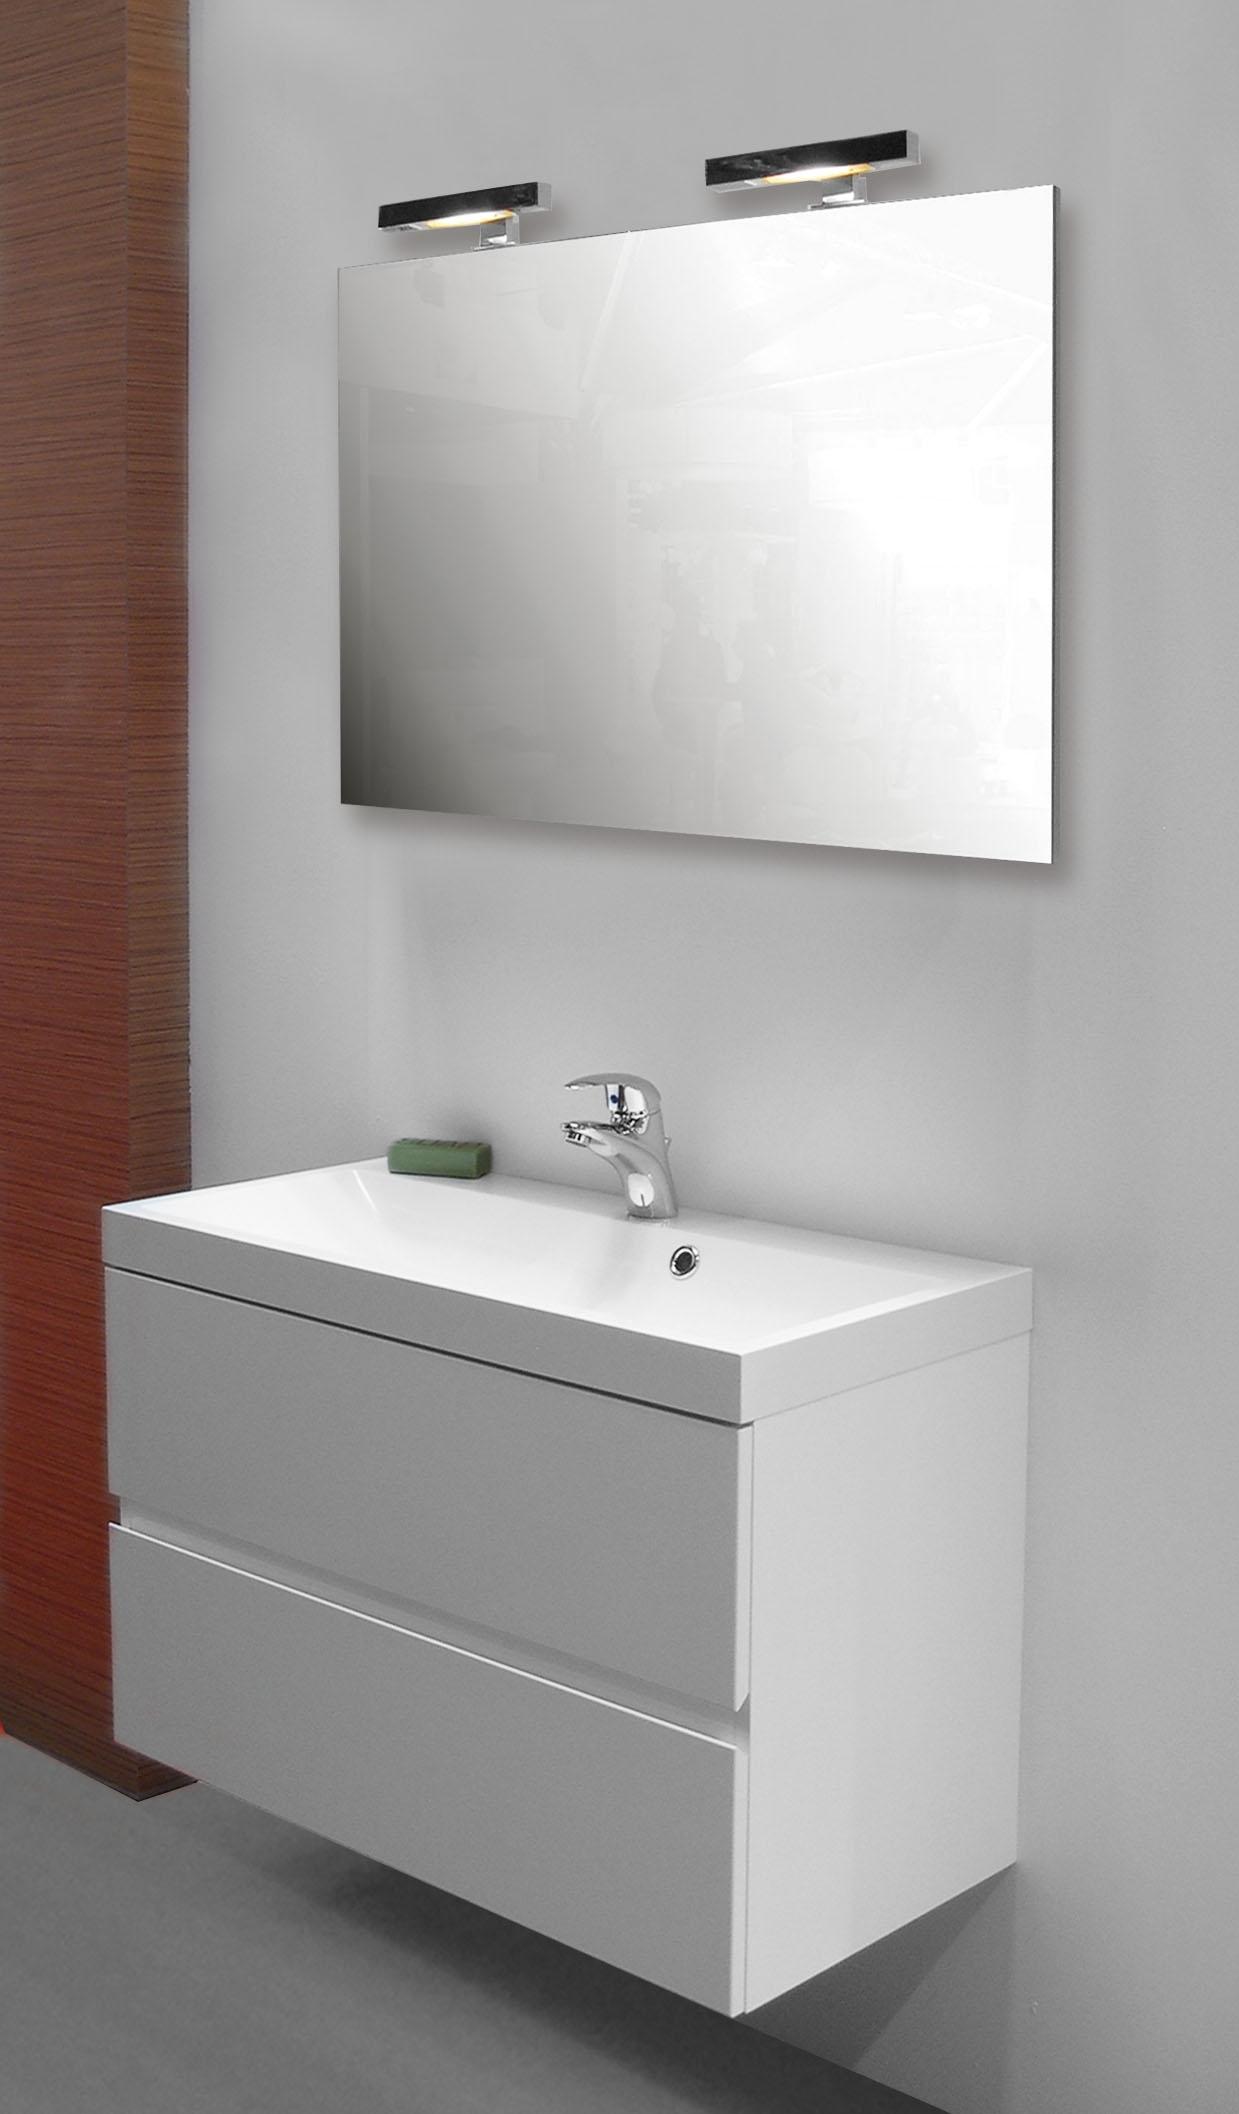 Tablette Salle De Bain 80 Cm ensemble de salle bain roxanne 80 cm blanc van marcke - mr.bricolage